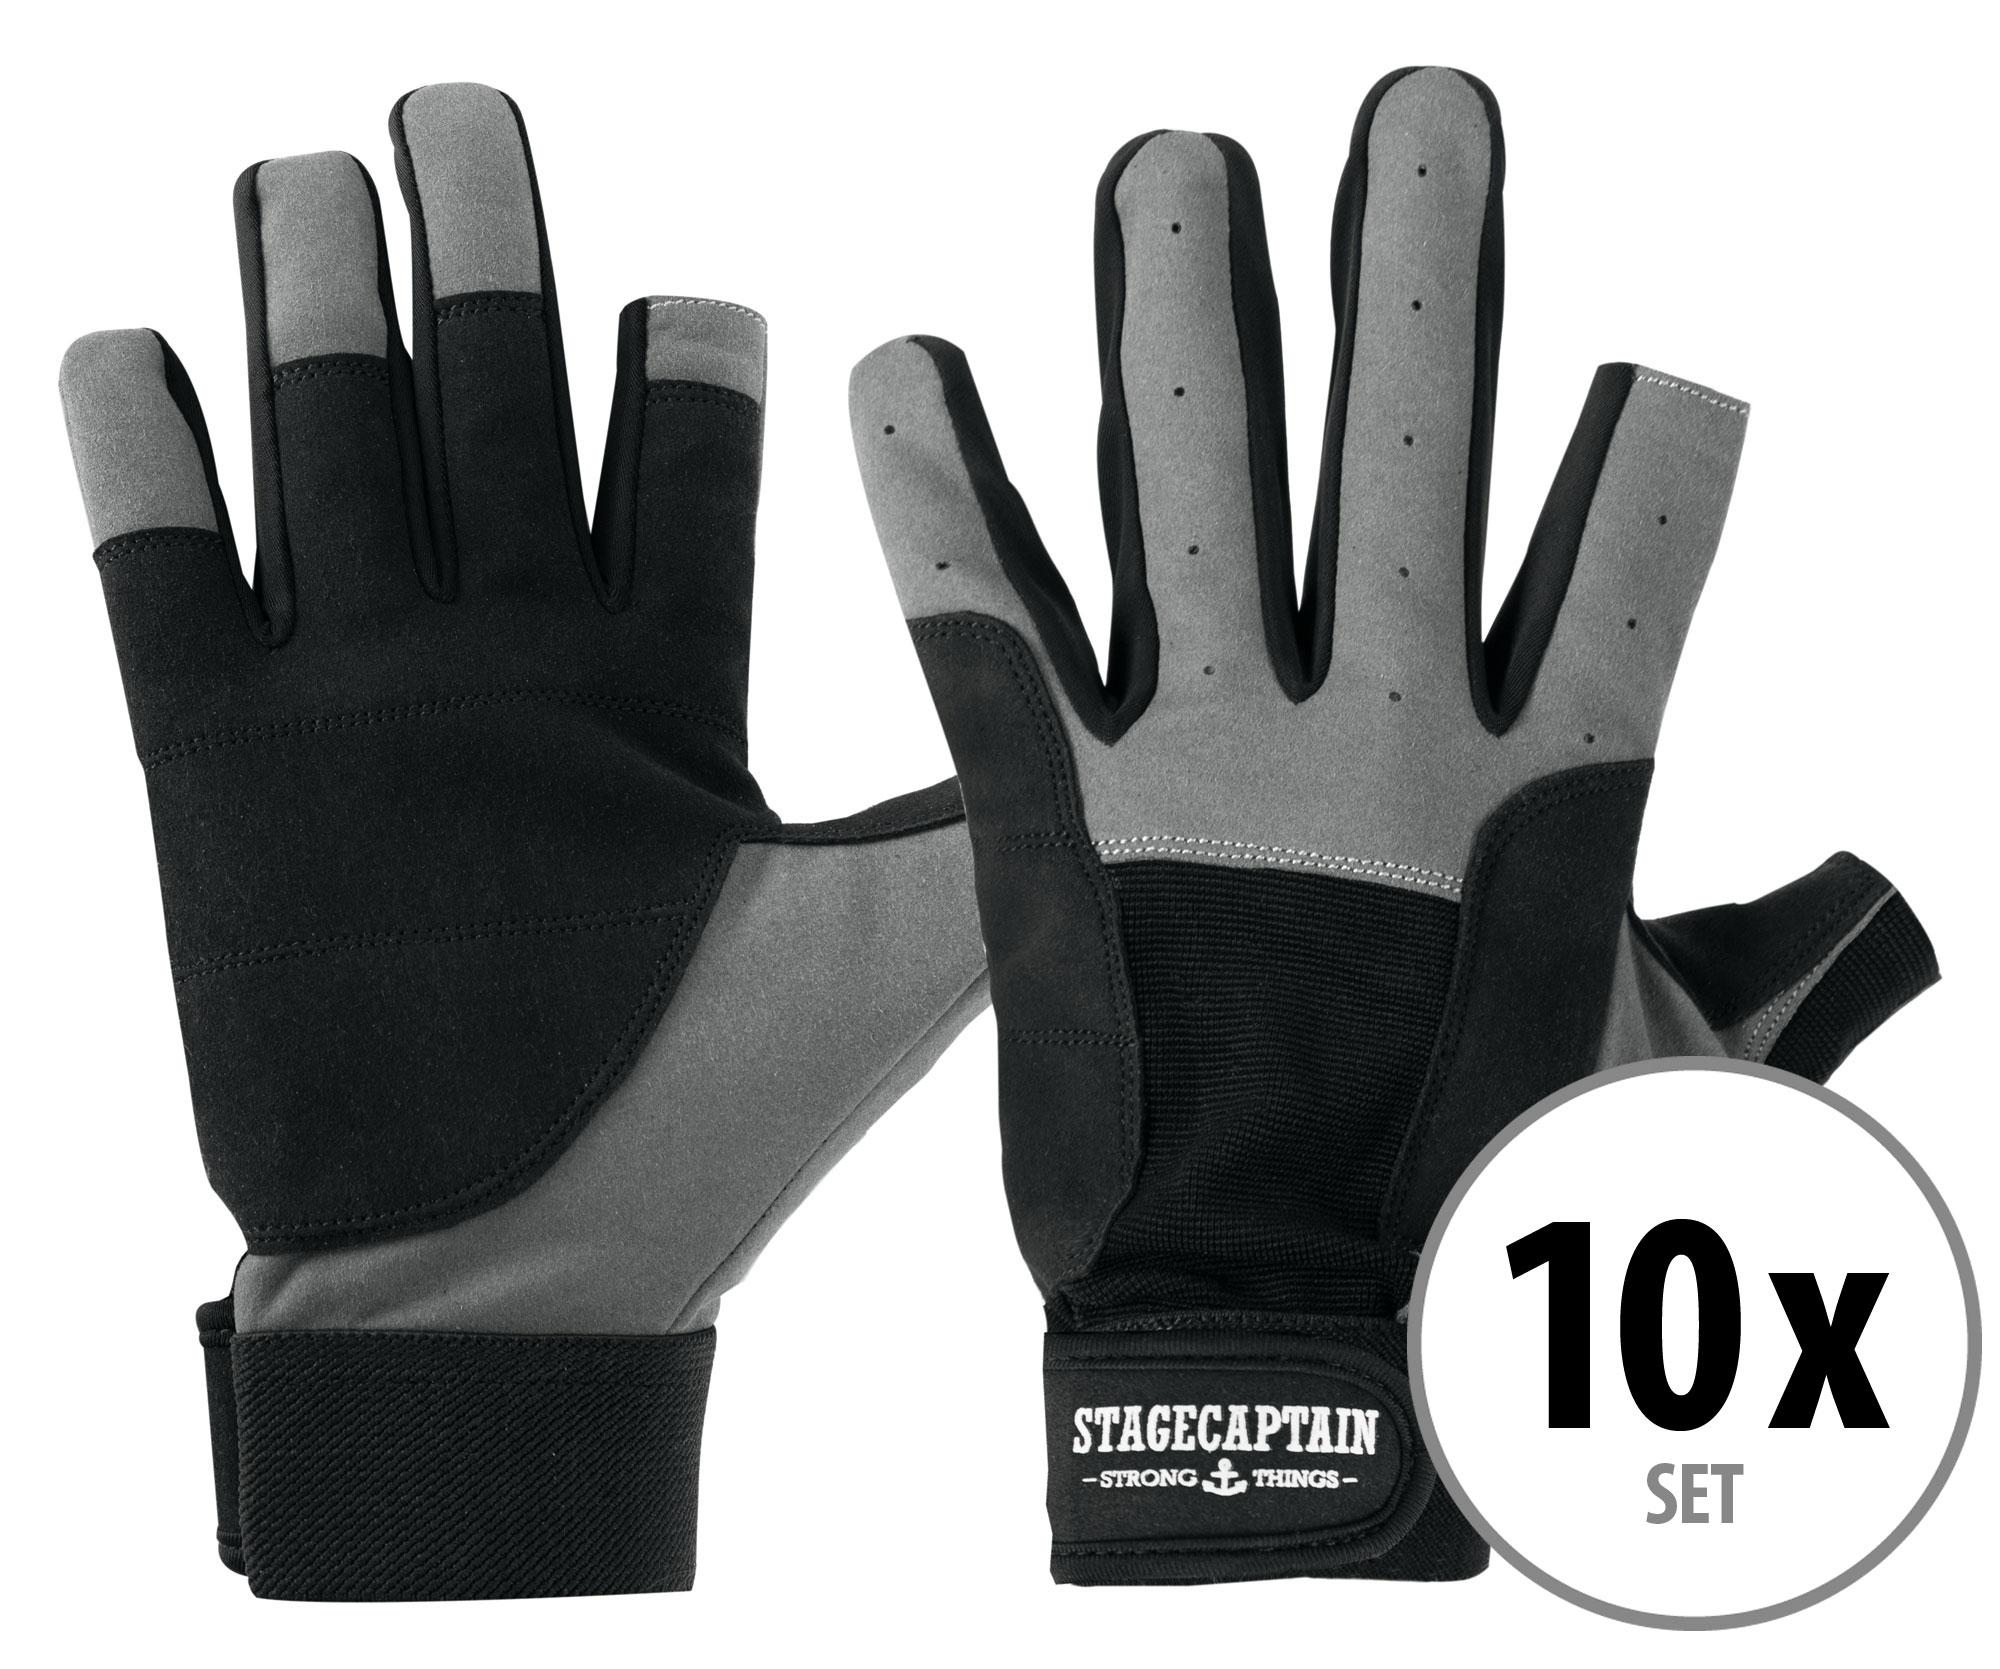 10er Set Stagecaptain Rigger Handschuhe M kurz